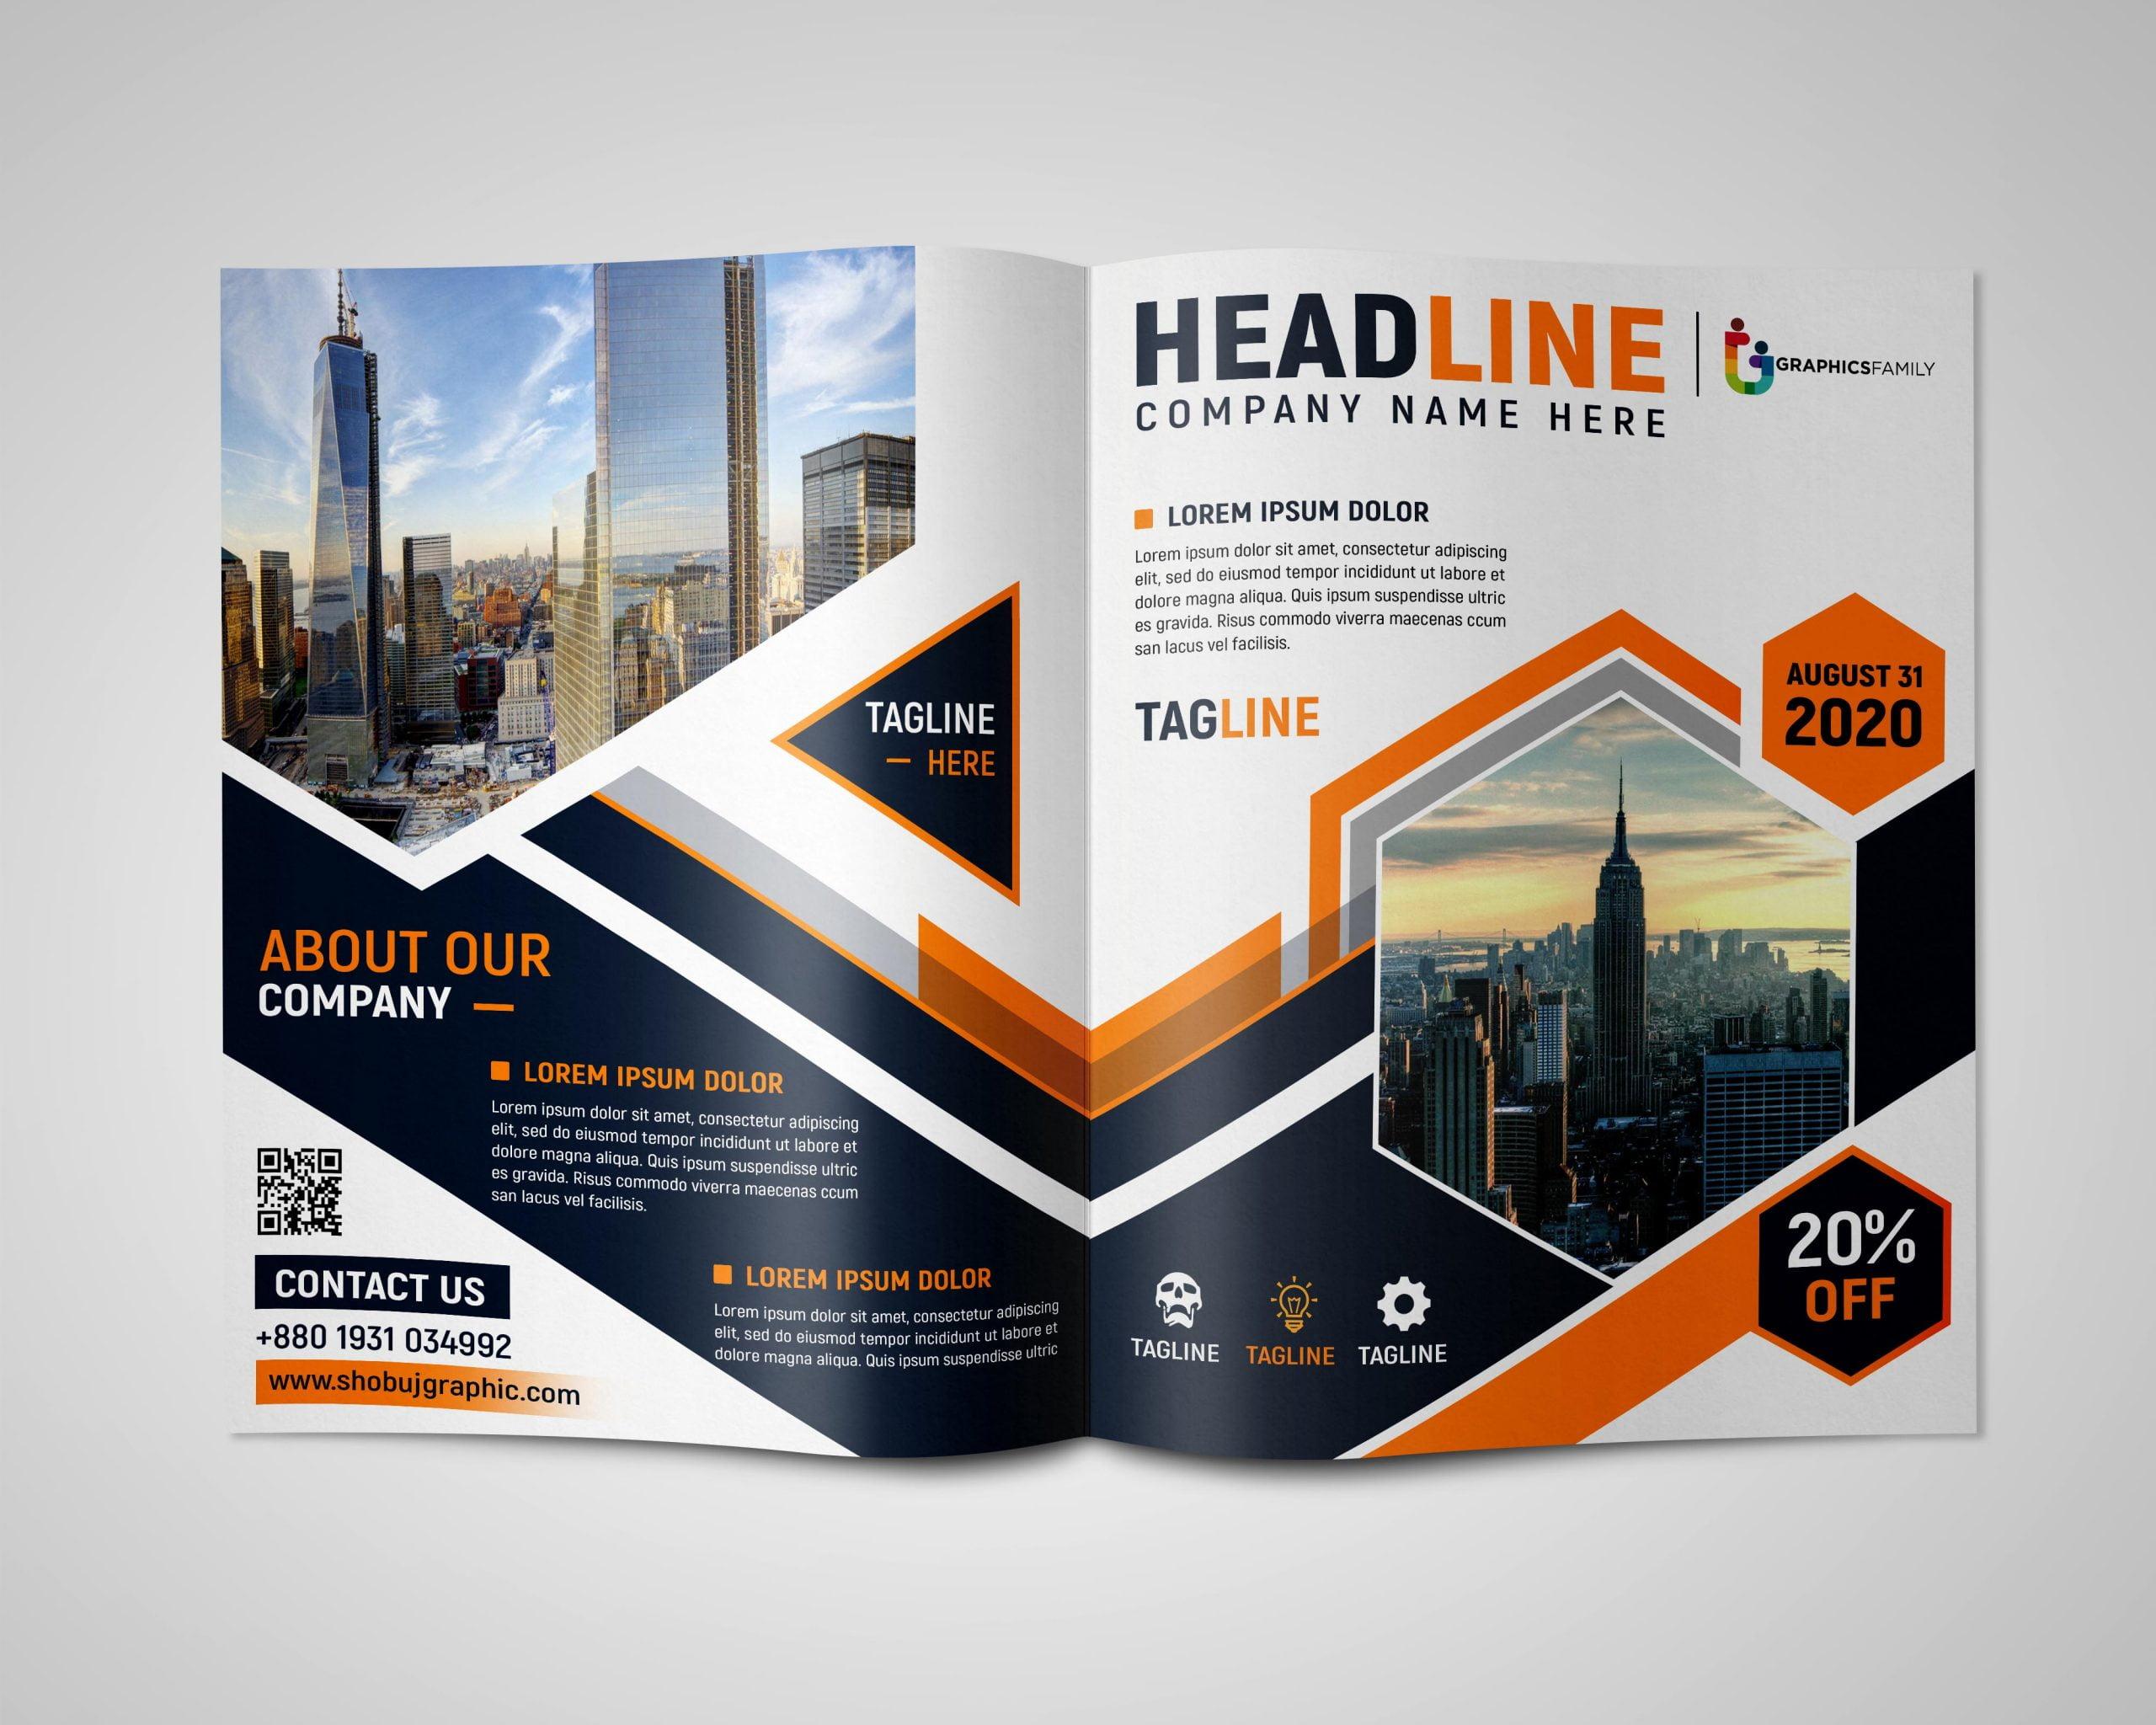 Professional Bi fold Brochure Design Free psd